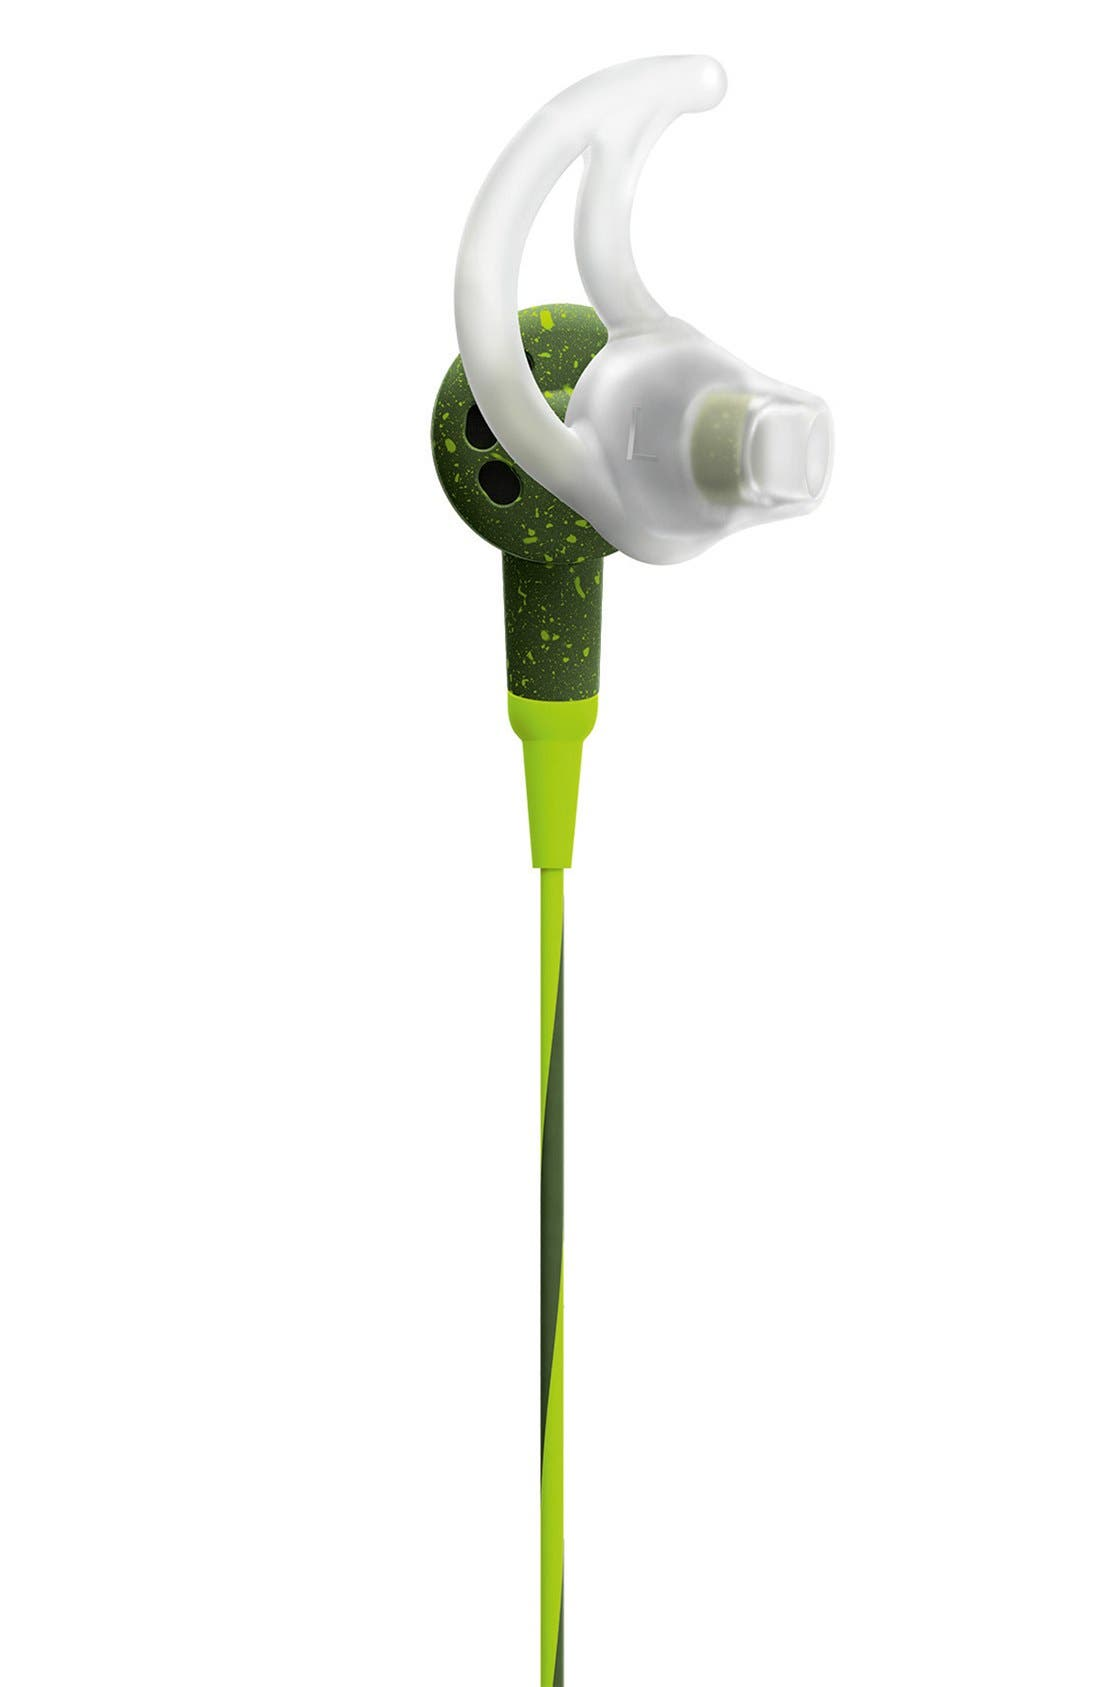 SoundSport<sup>®</sup> In-Ear Headphones,                             Alternate thumbnail 4, color,                             300